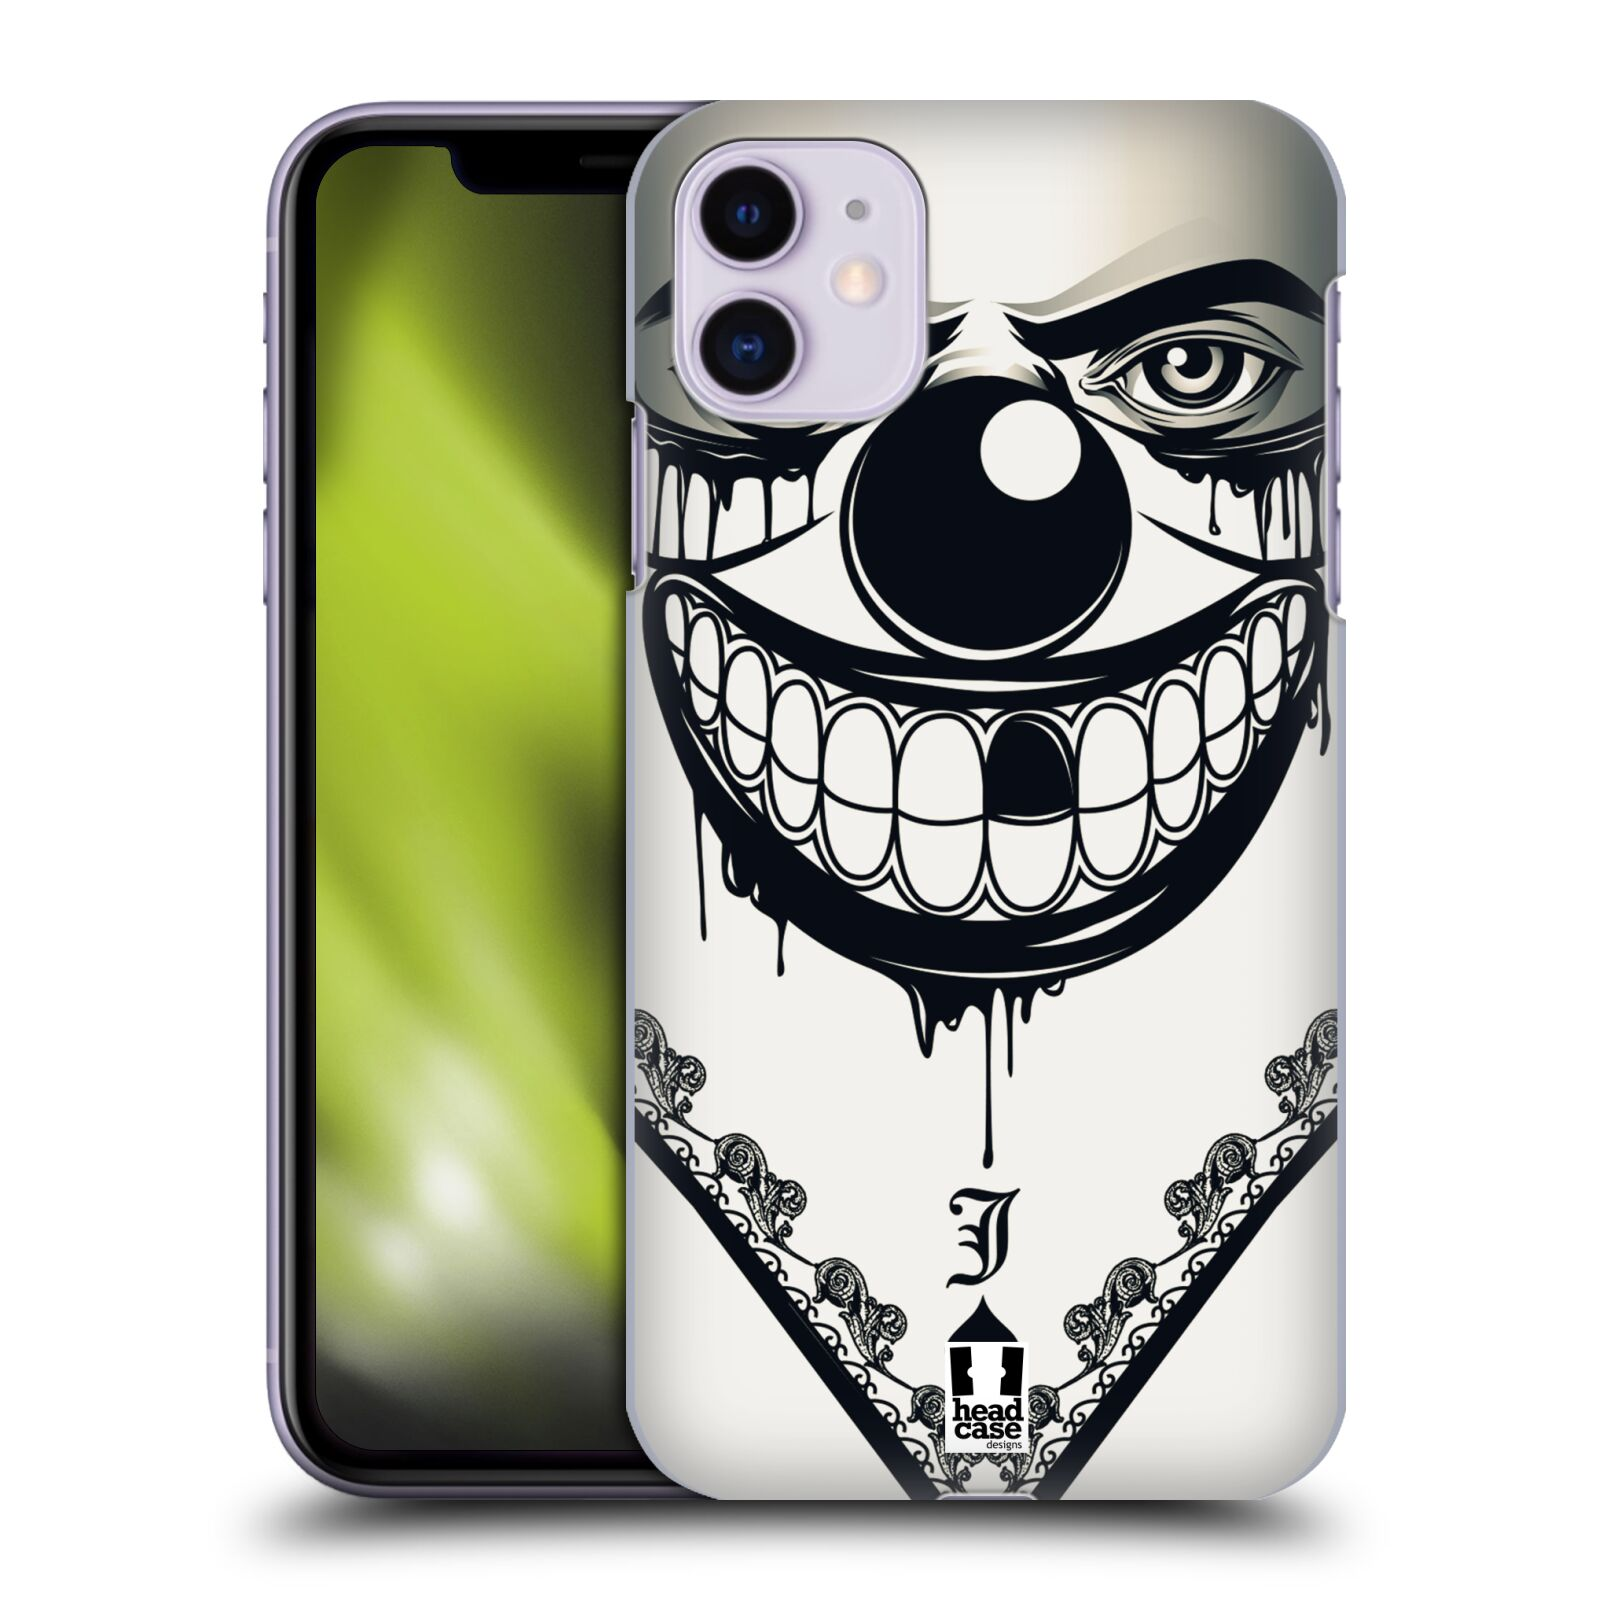 Plastové pouzdro na mobil Apple iPhone 11 - Head Case - ZLEJ KLAUN